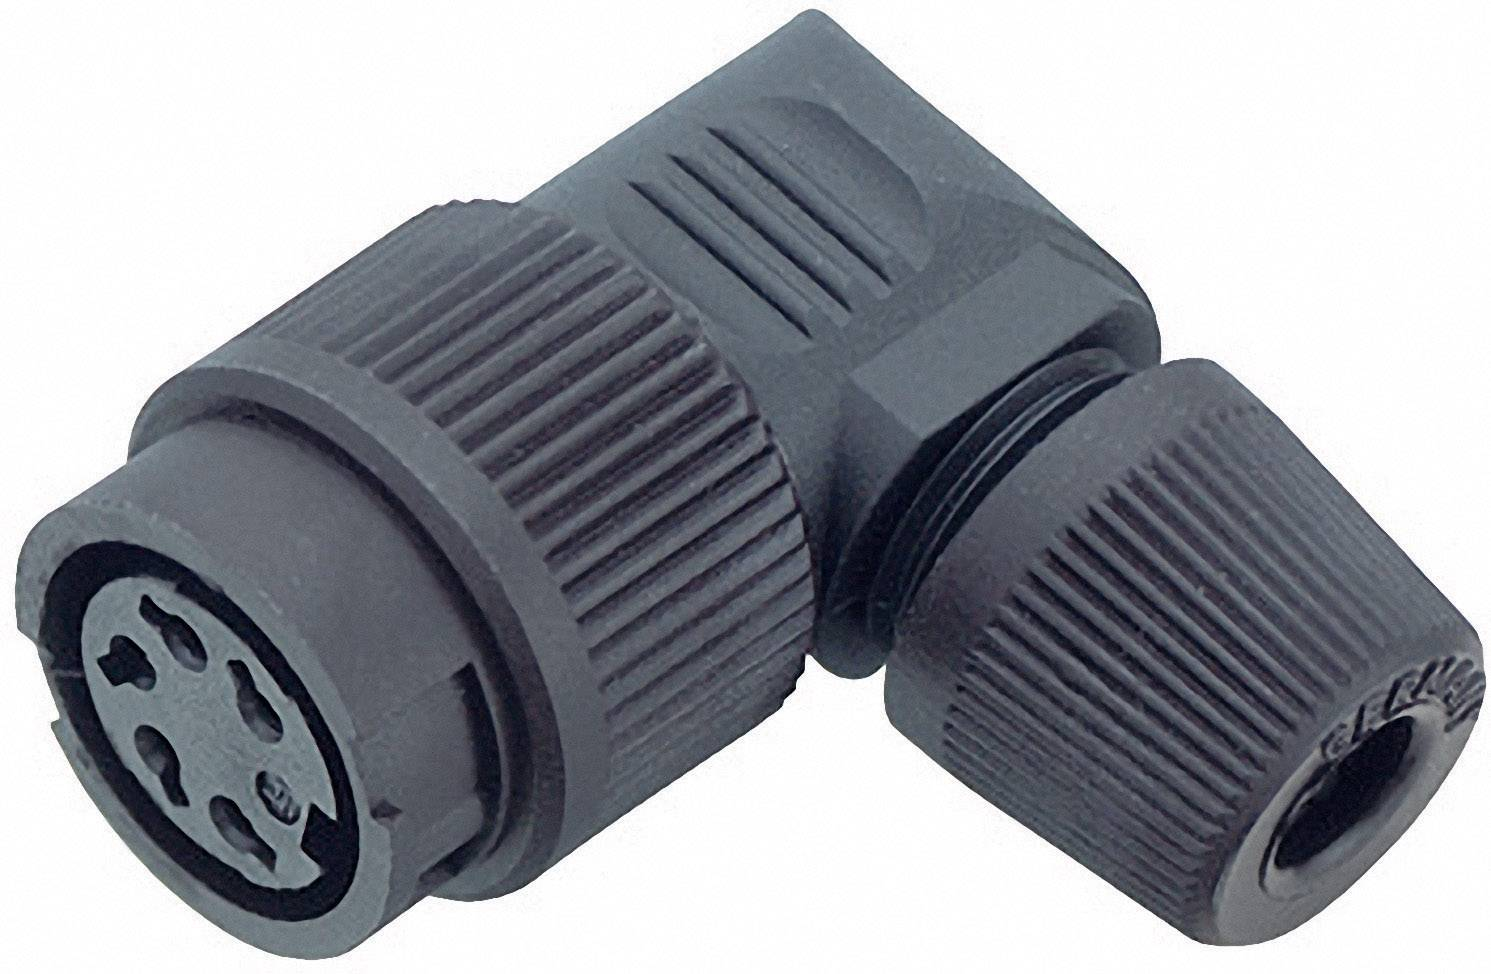 Kabelový konektor Binder 99-0646-70-08, 8pól., 0.75 mm², 4 - 6 mm, IP40, černá